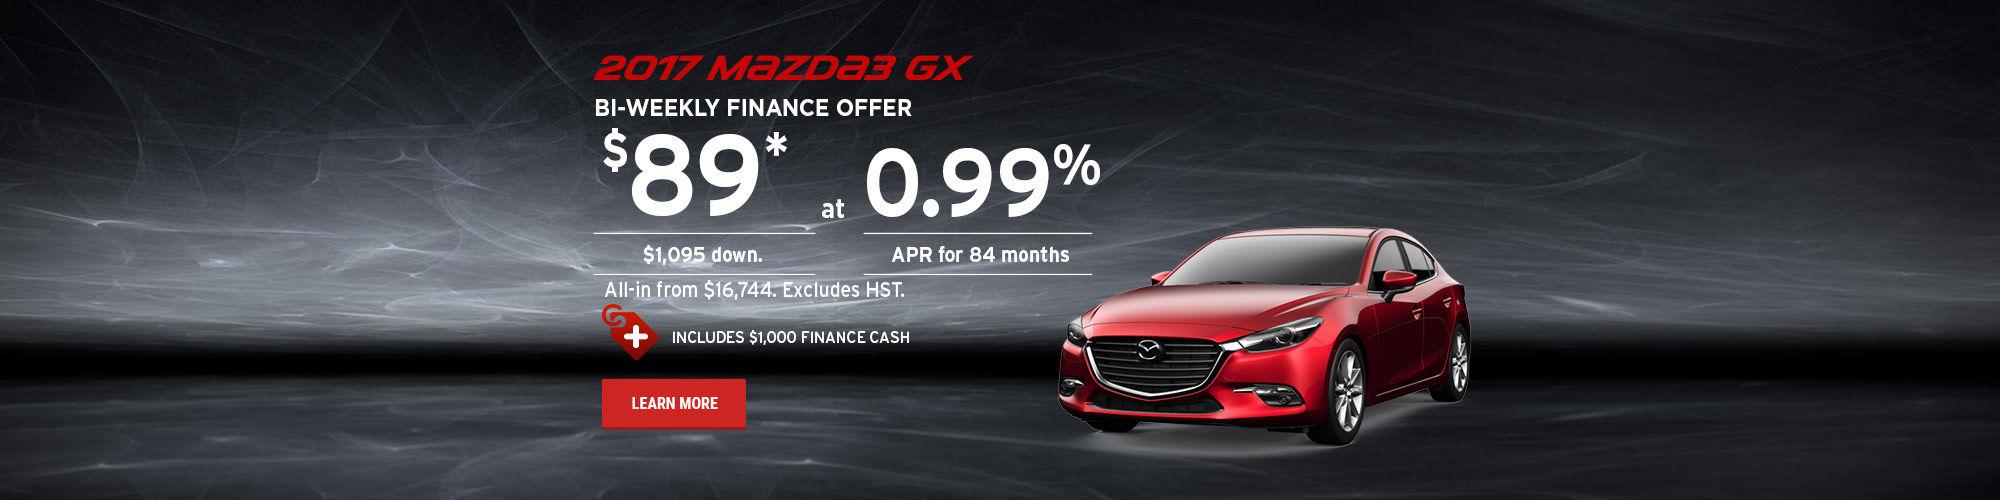 Mazda's Summer Drive Event - M3